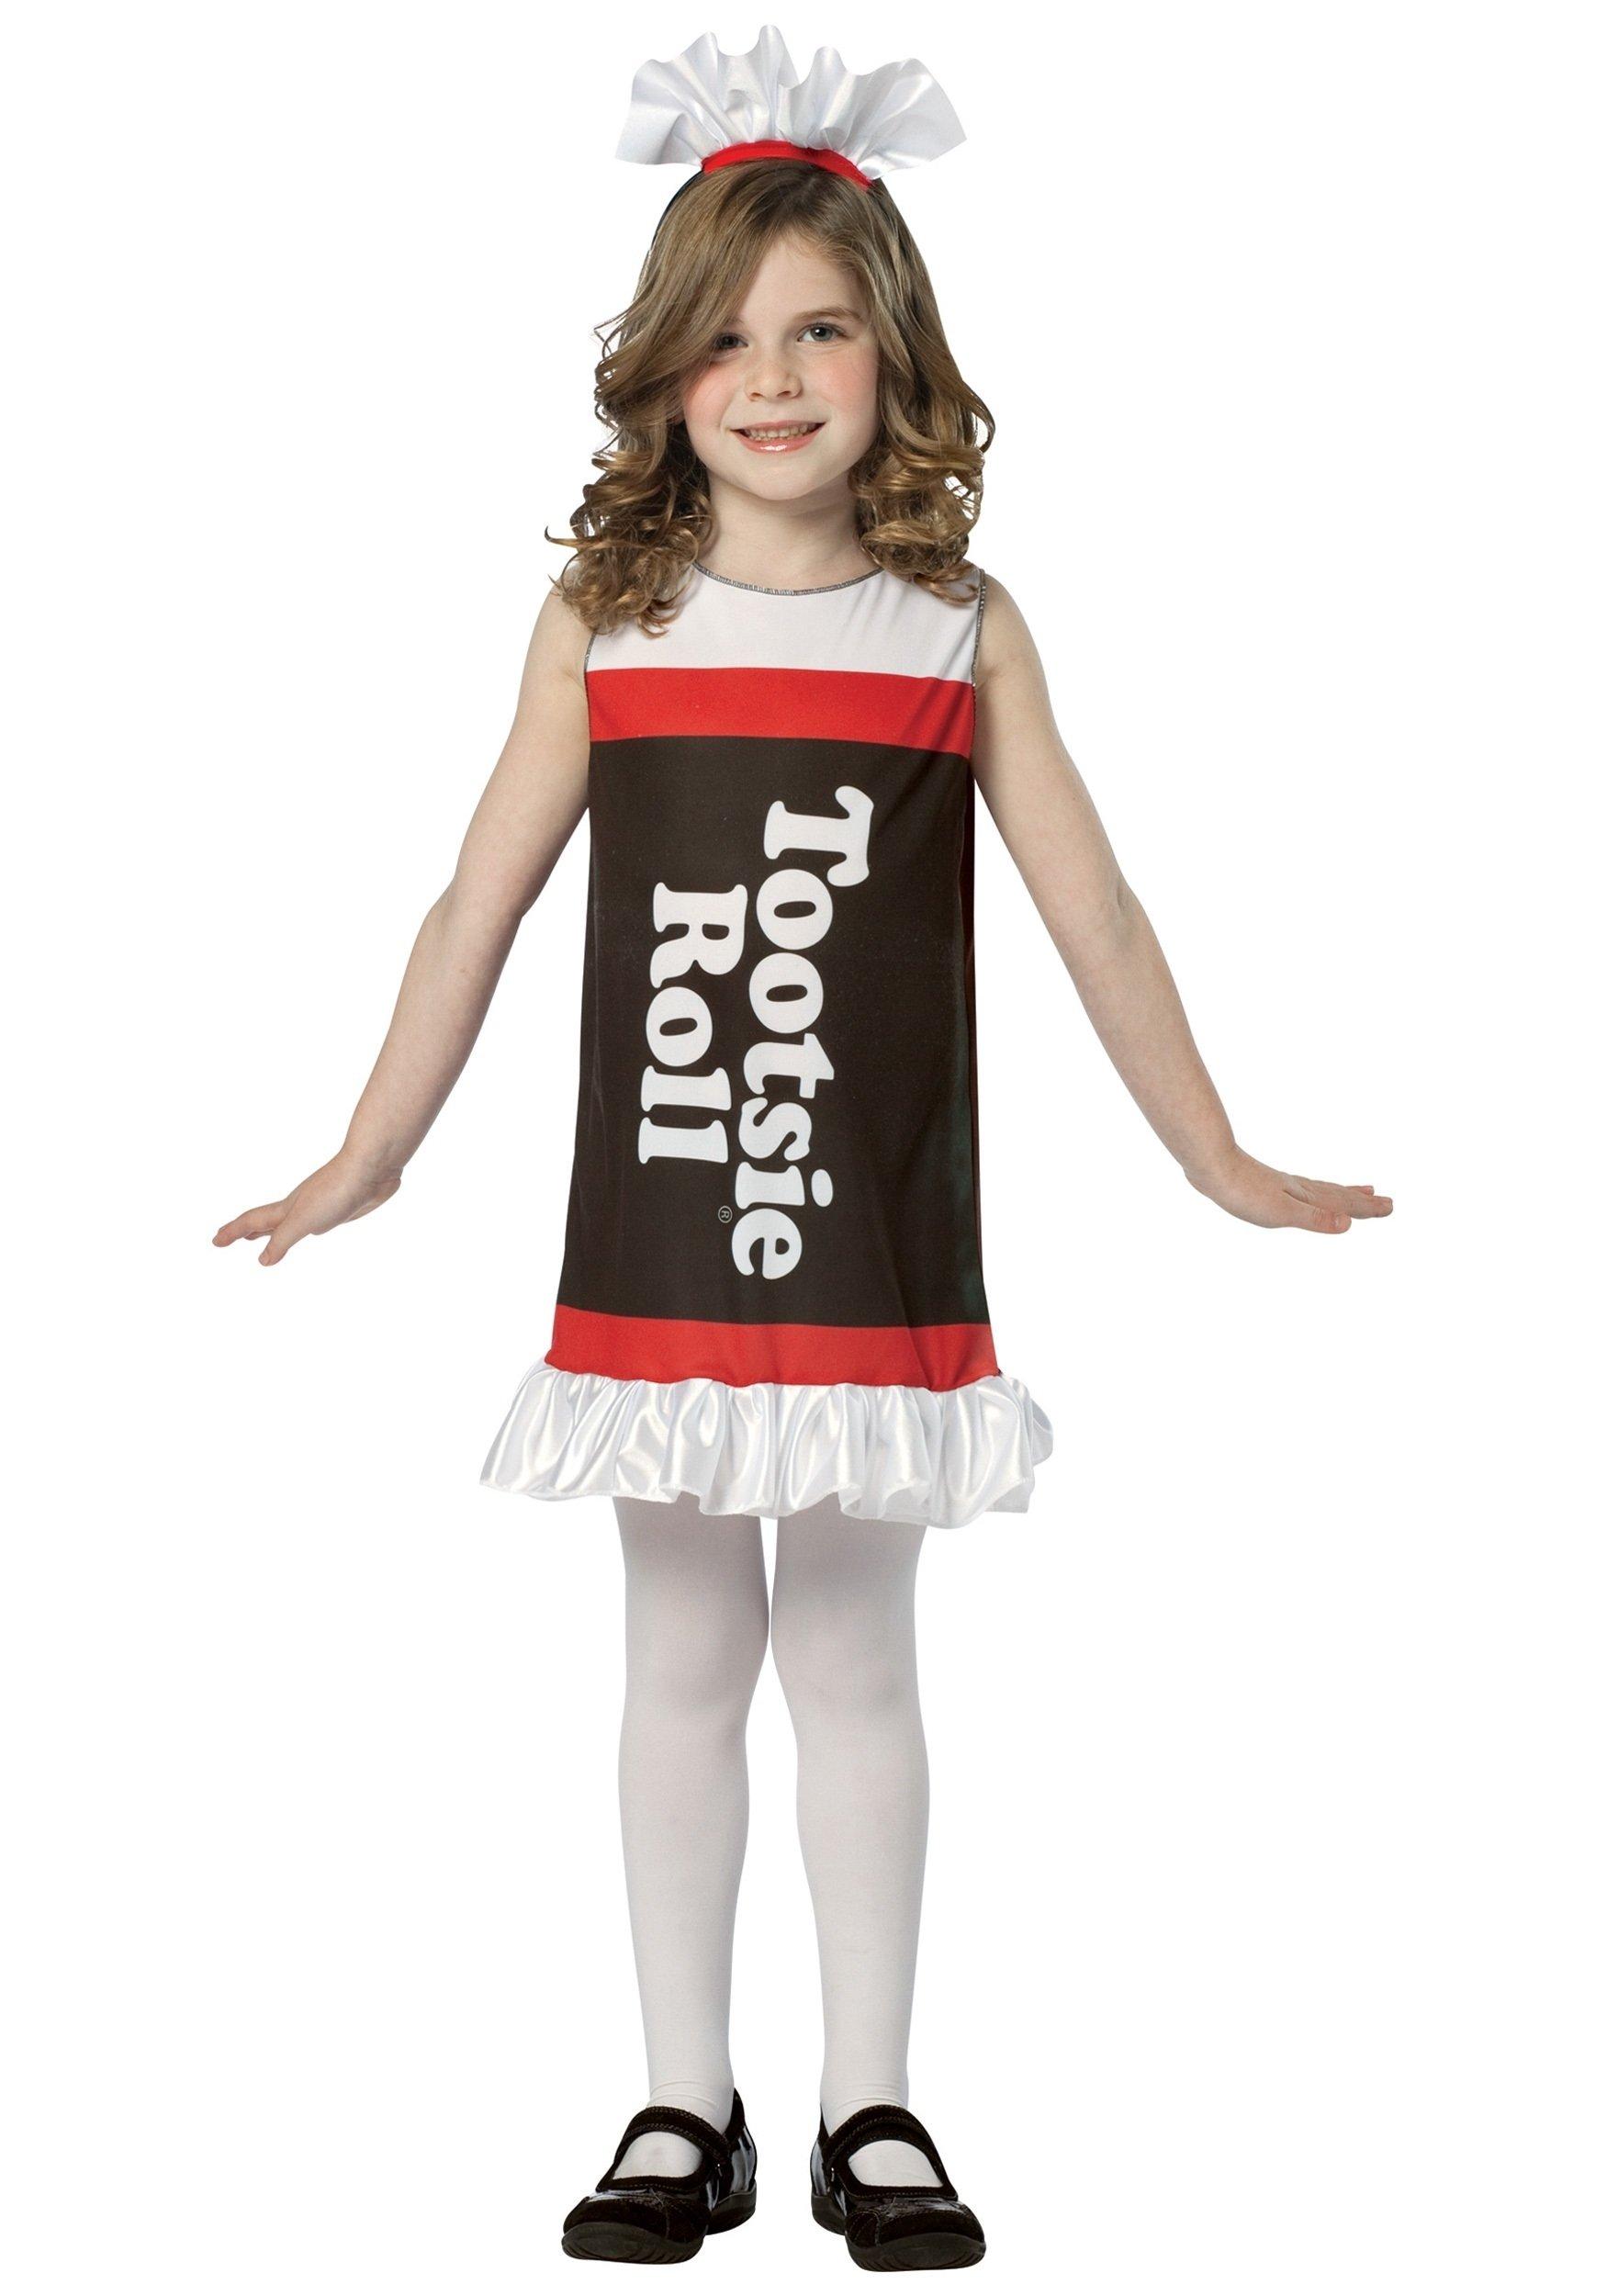 10 Perfect Ideas For Kids Halloween Costumes girls tootsie roll dress 15 2021